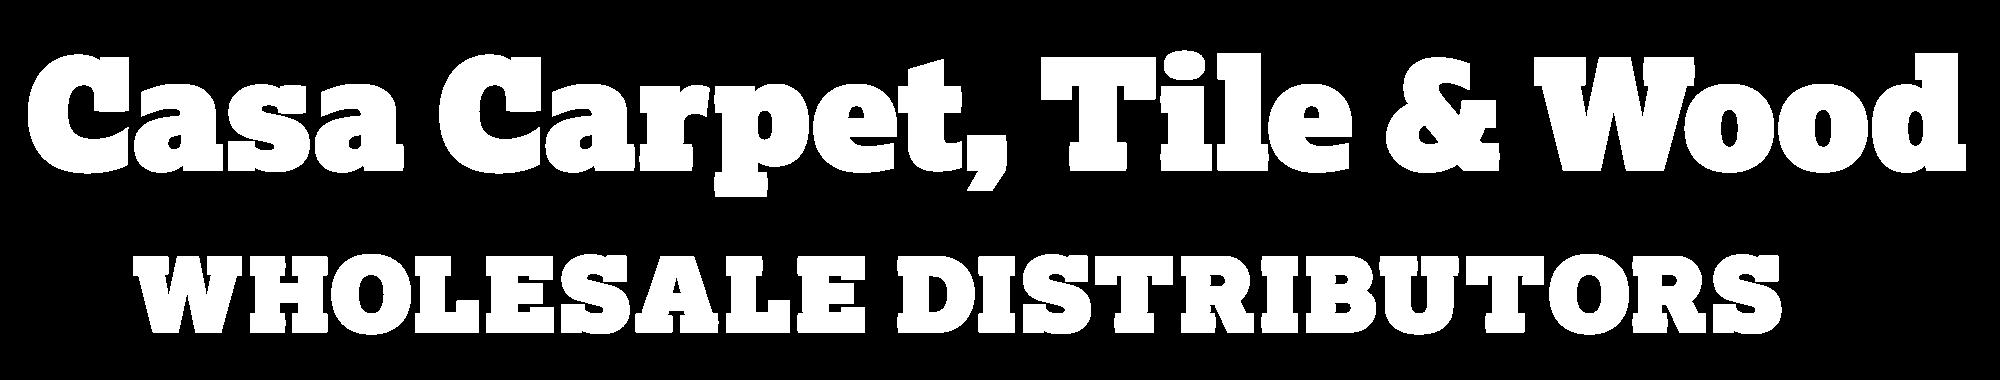 www casacarpetandtile com